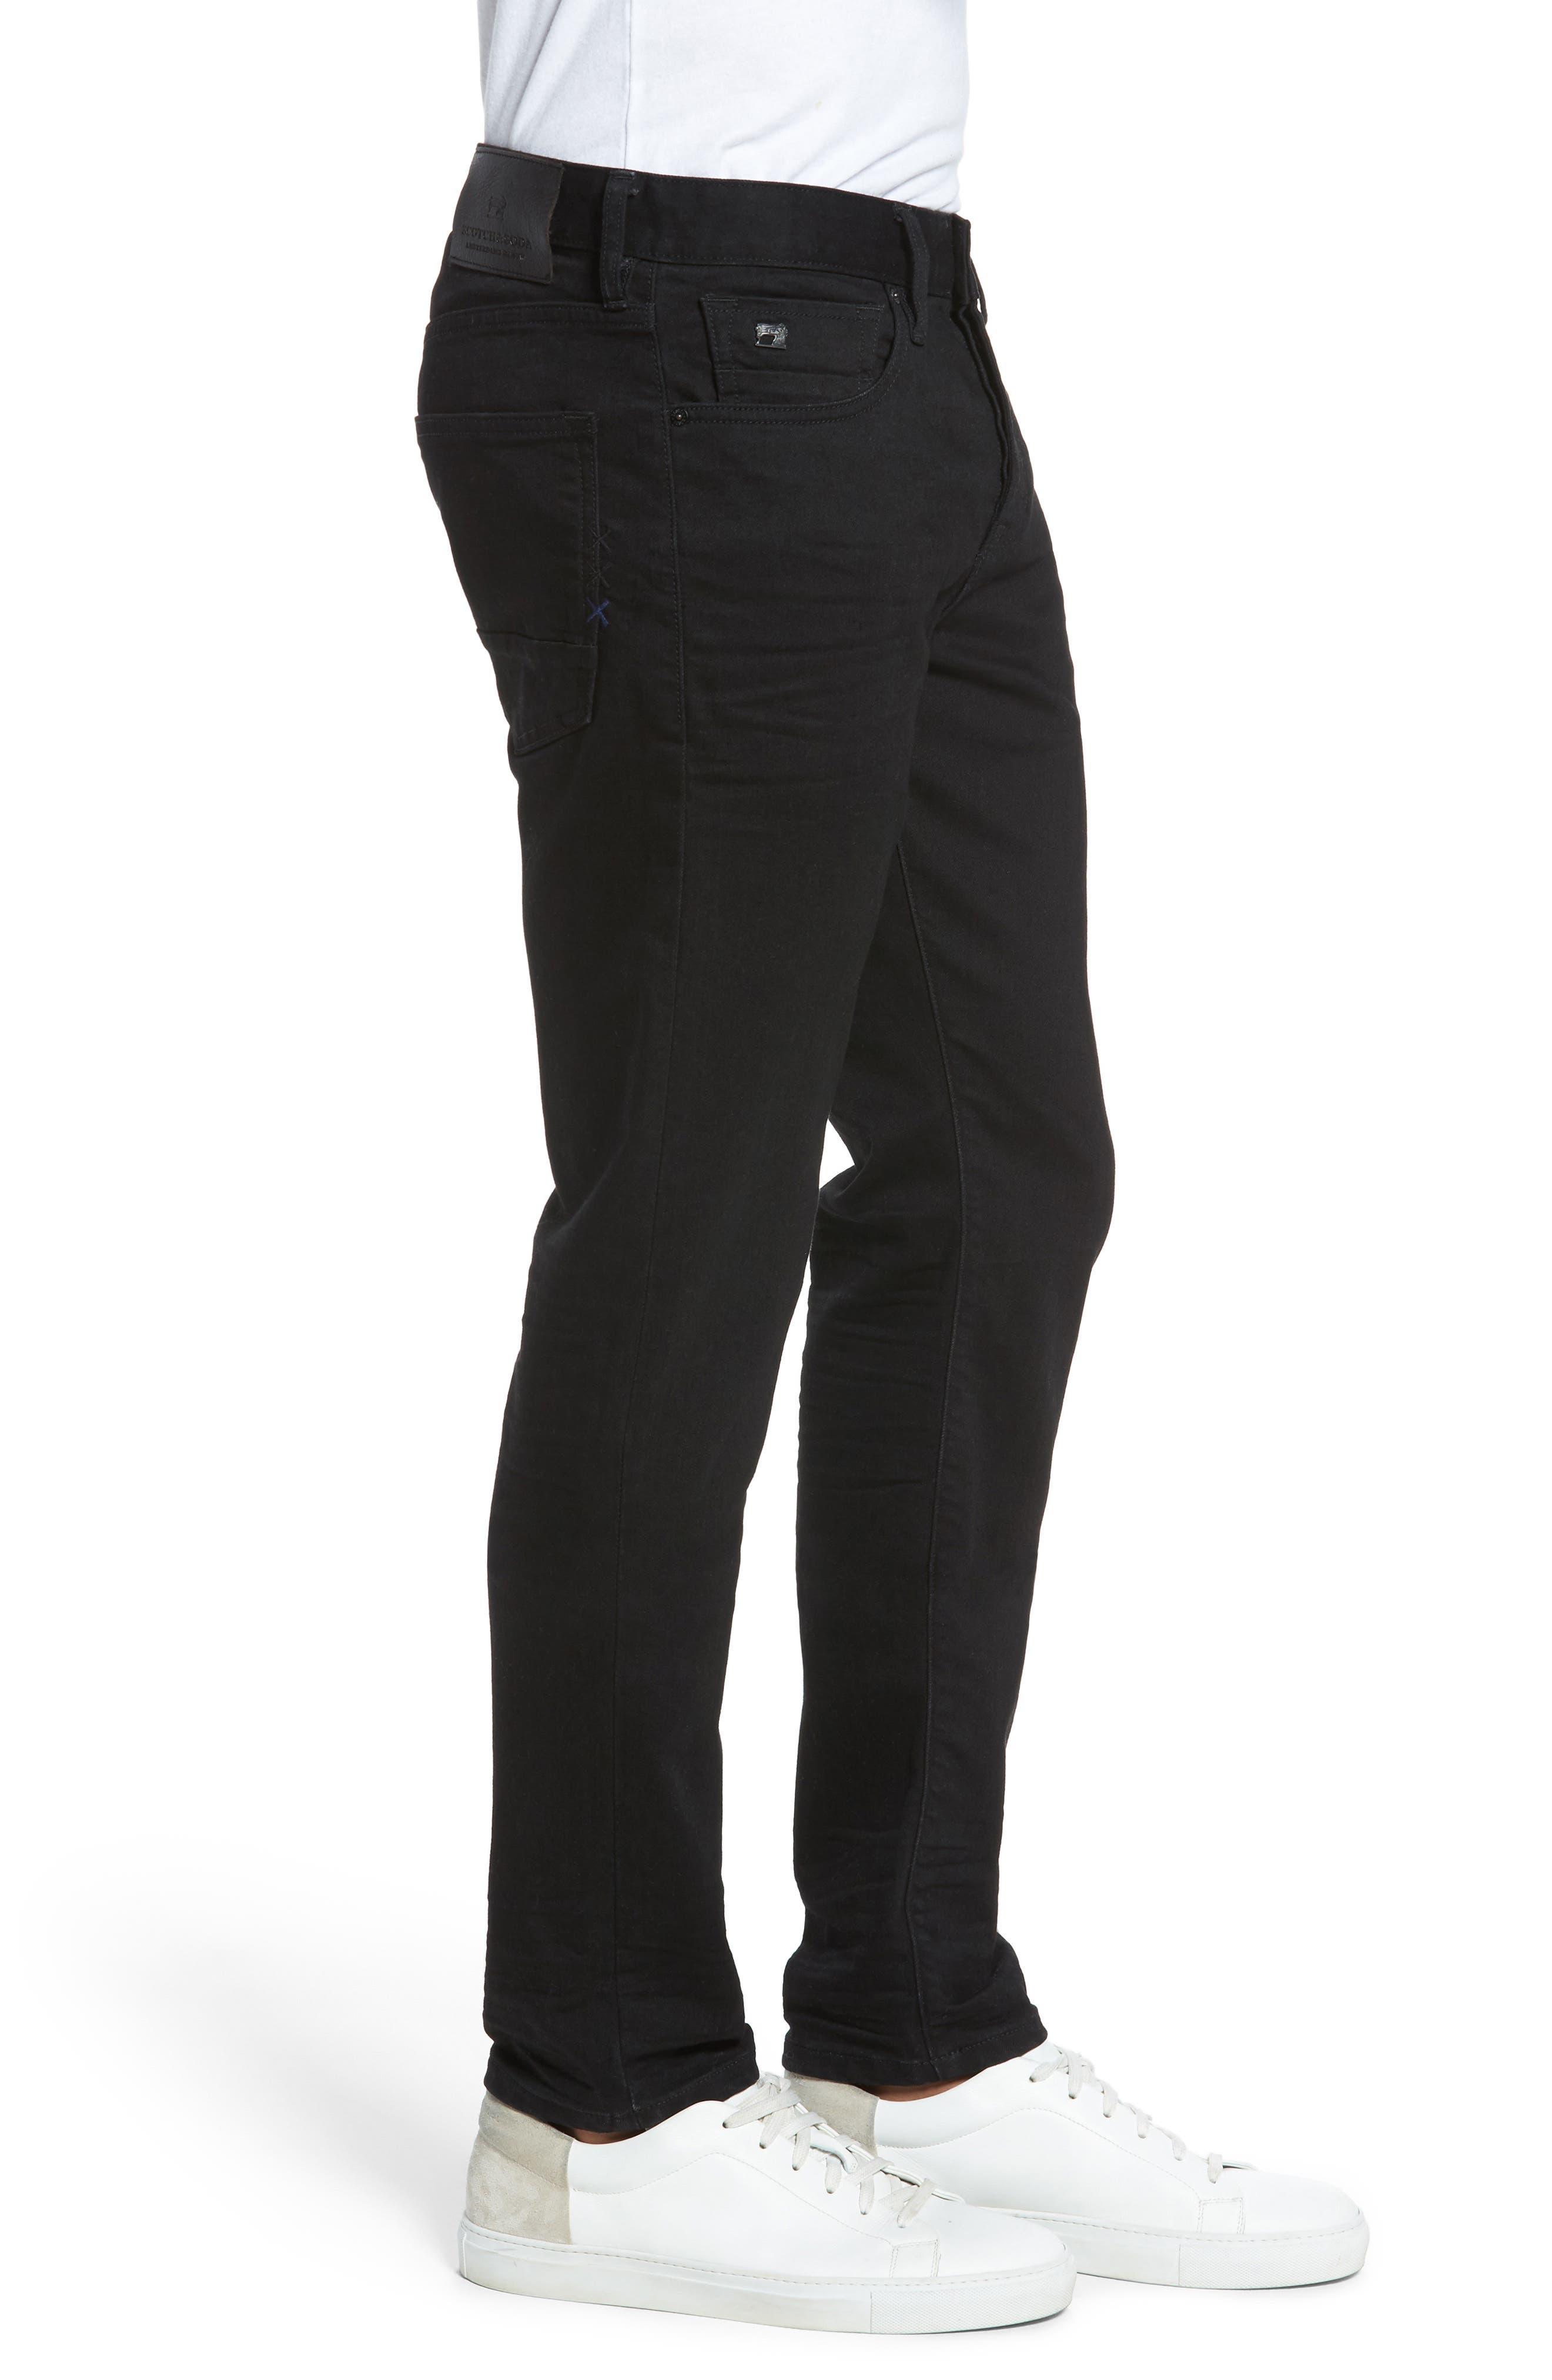 Alternate Image 3  - Scotch & Soda Ralston Slim Straight Leg Jeans (Stay Black)